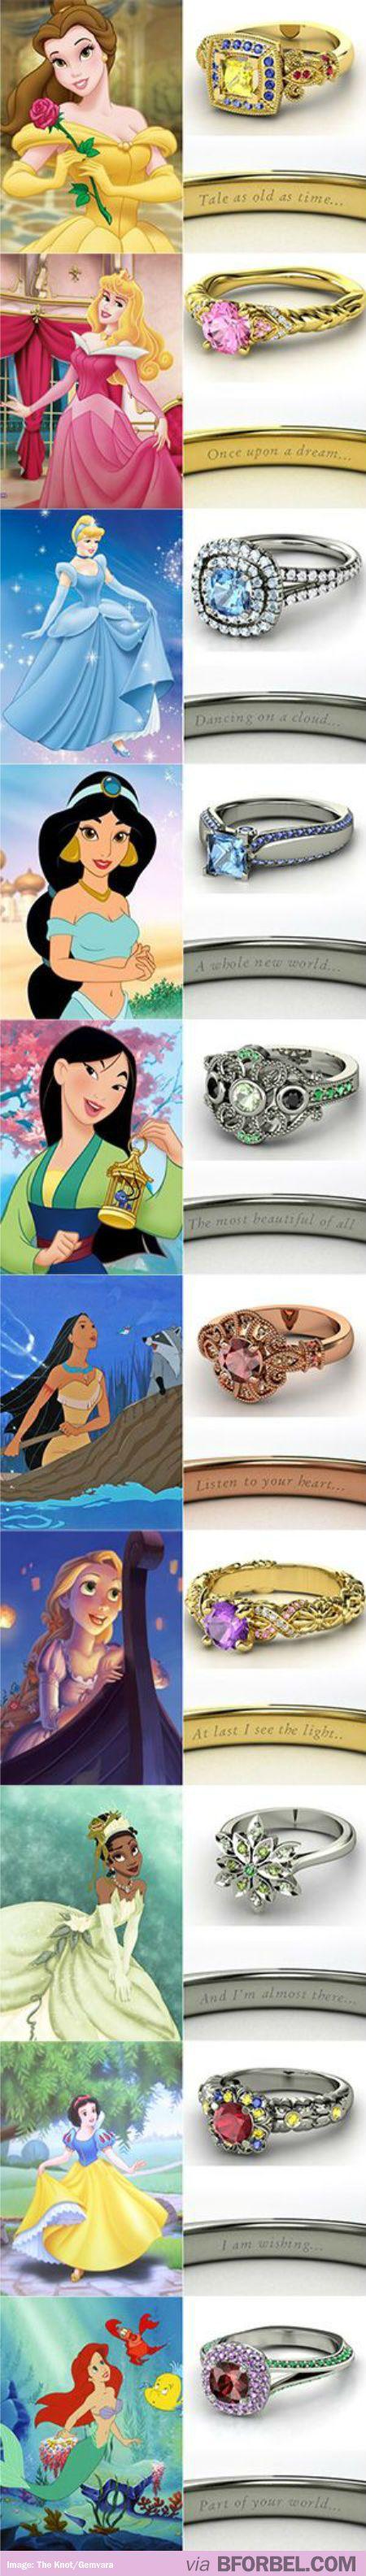 wedding rings disney wedding ring Disney Princess Inspired Wedding Rings Love Cinderella s